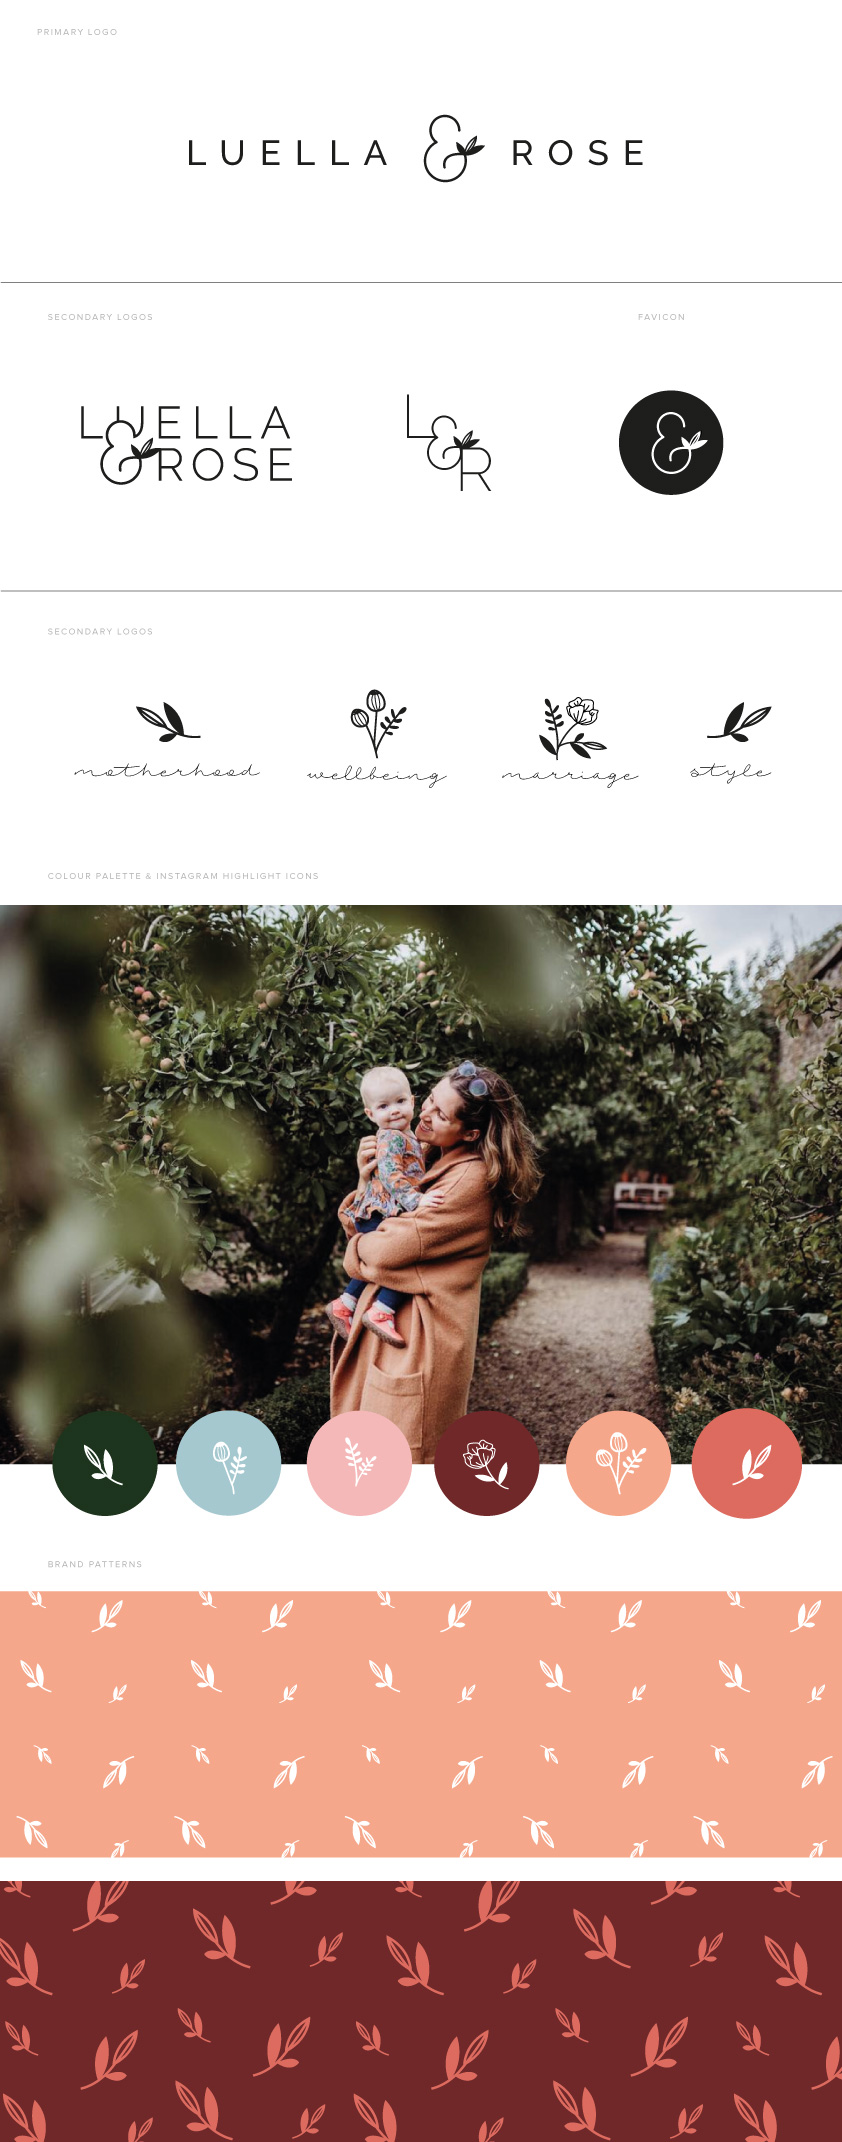 Luella&rose_brand-board.jpg